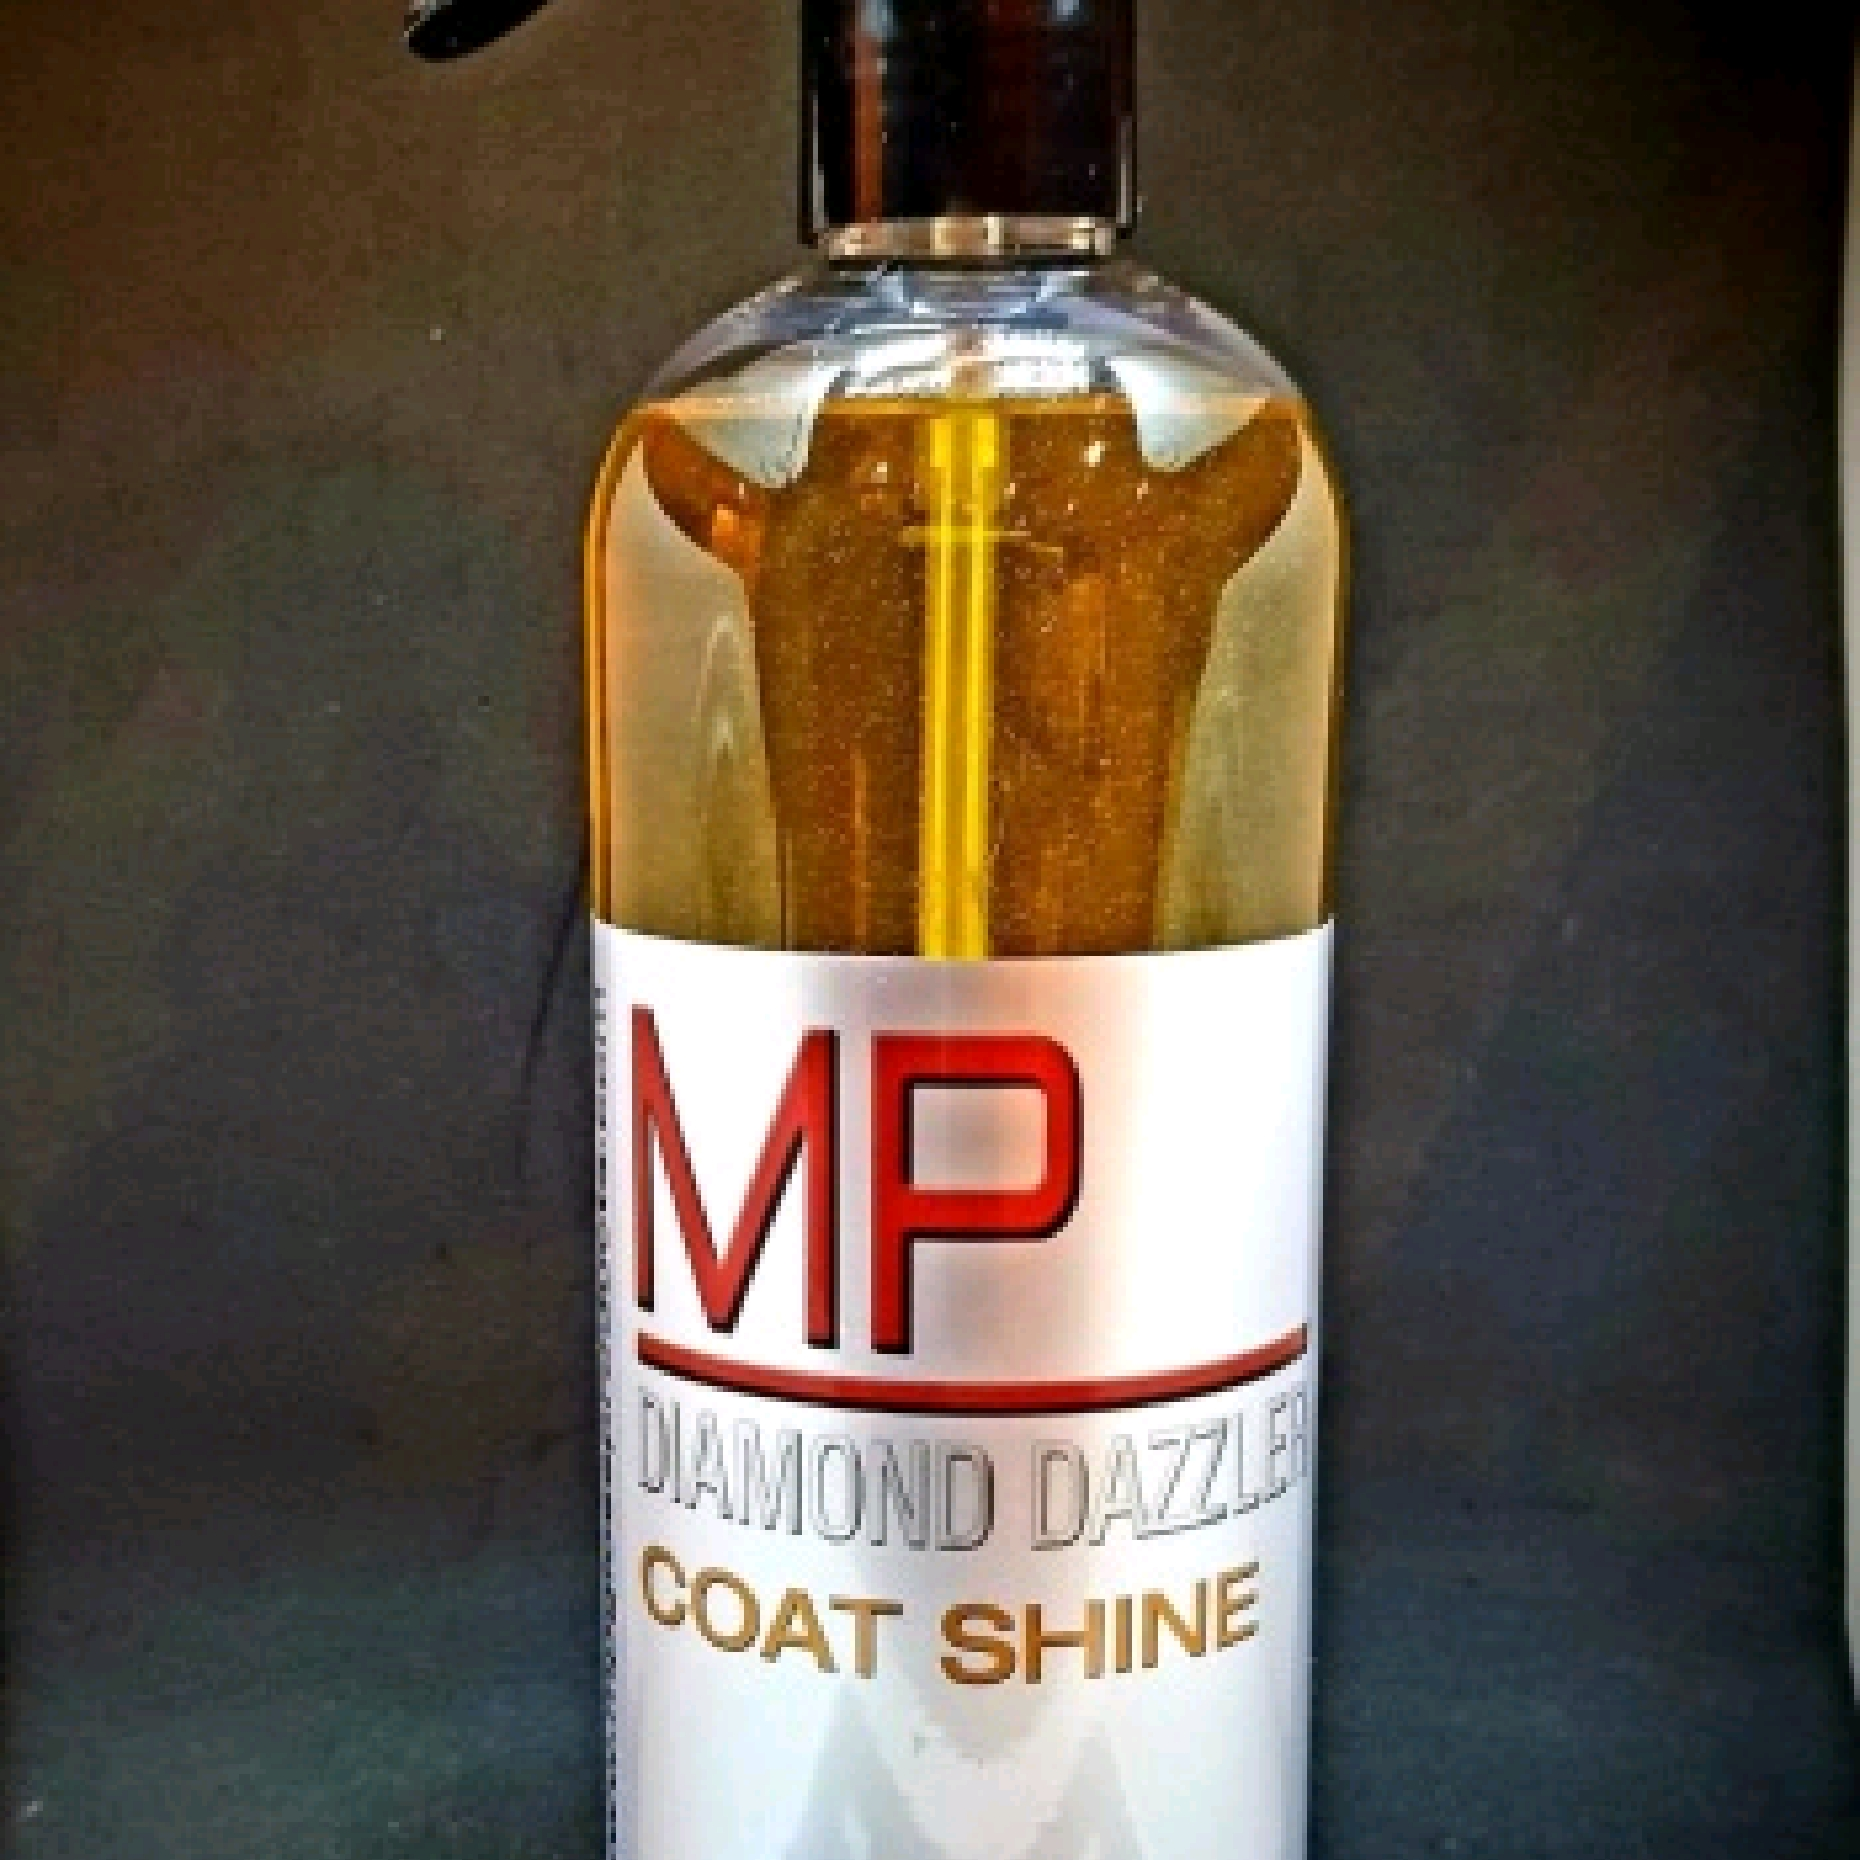 MP Diamond Dazzler Coat Shine